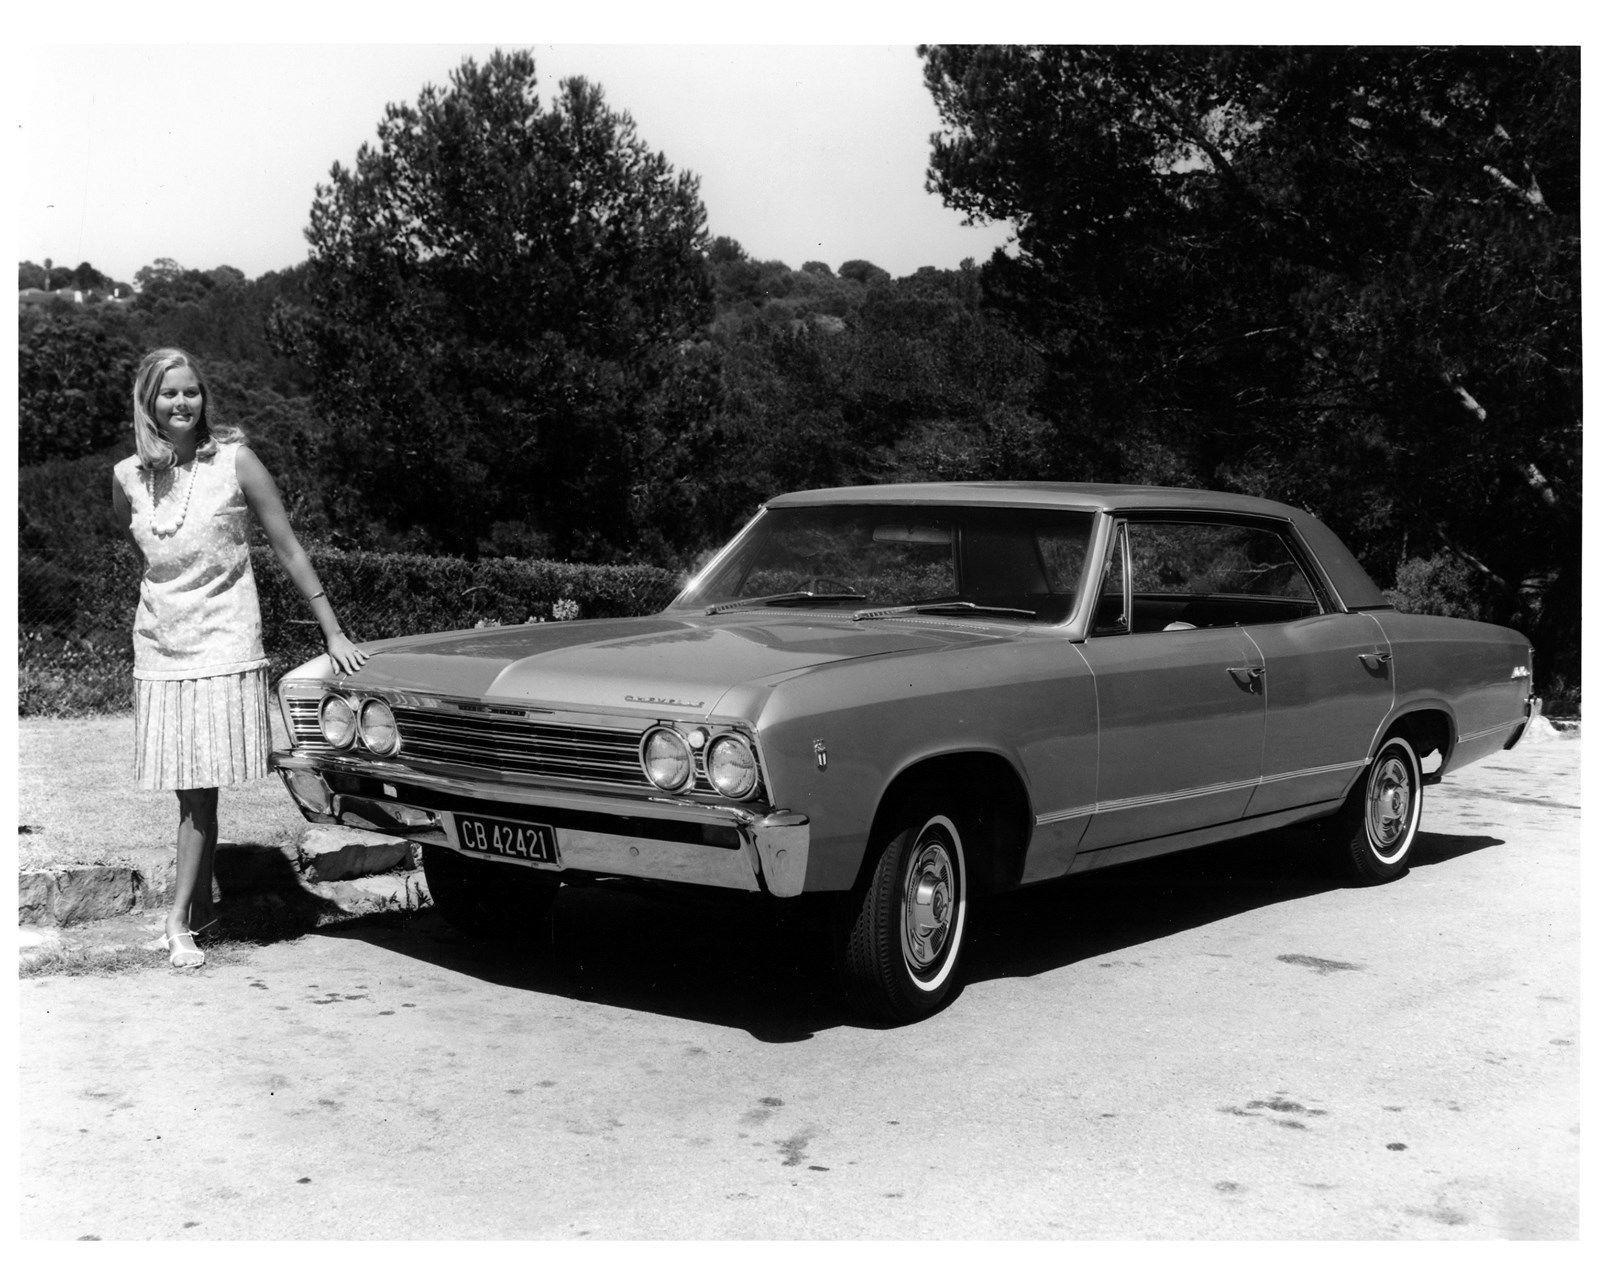 1967 Chevrolet South Africa Chevelle Malibu Sport Factory Photo Cb0920 Ebay Chevrolet Malibu Chevelle